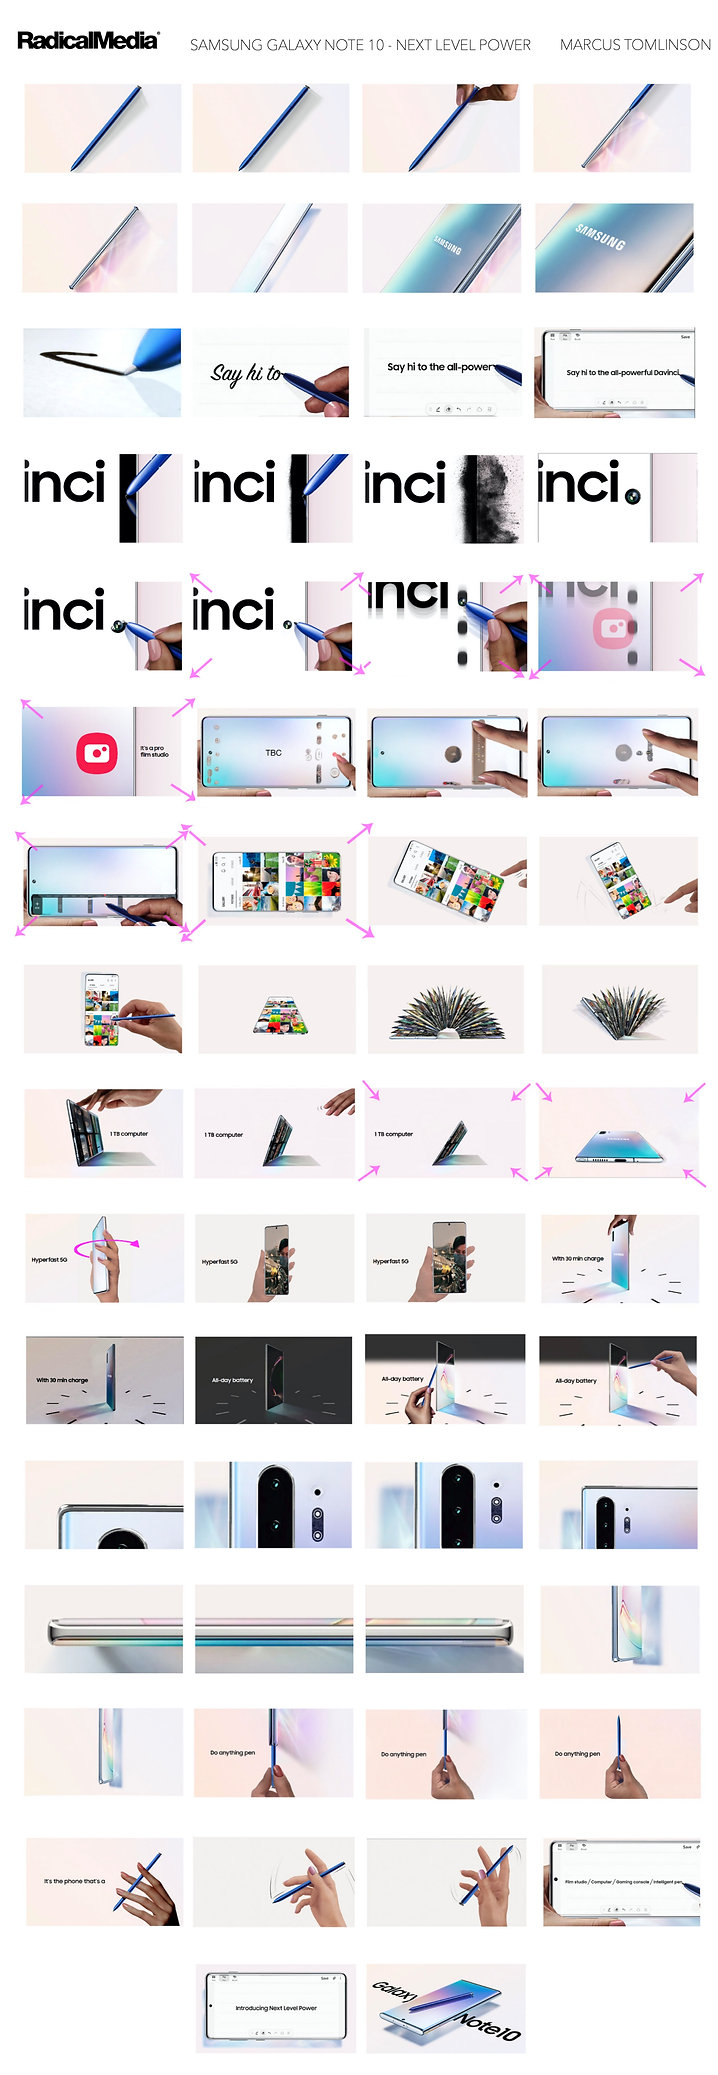 Samsung web layout.jpg